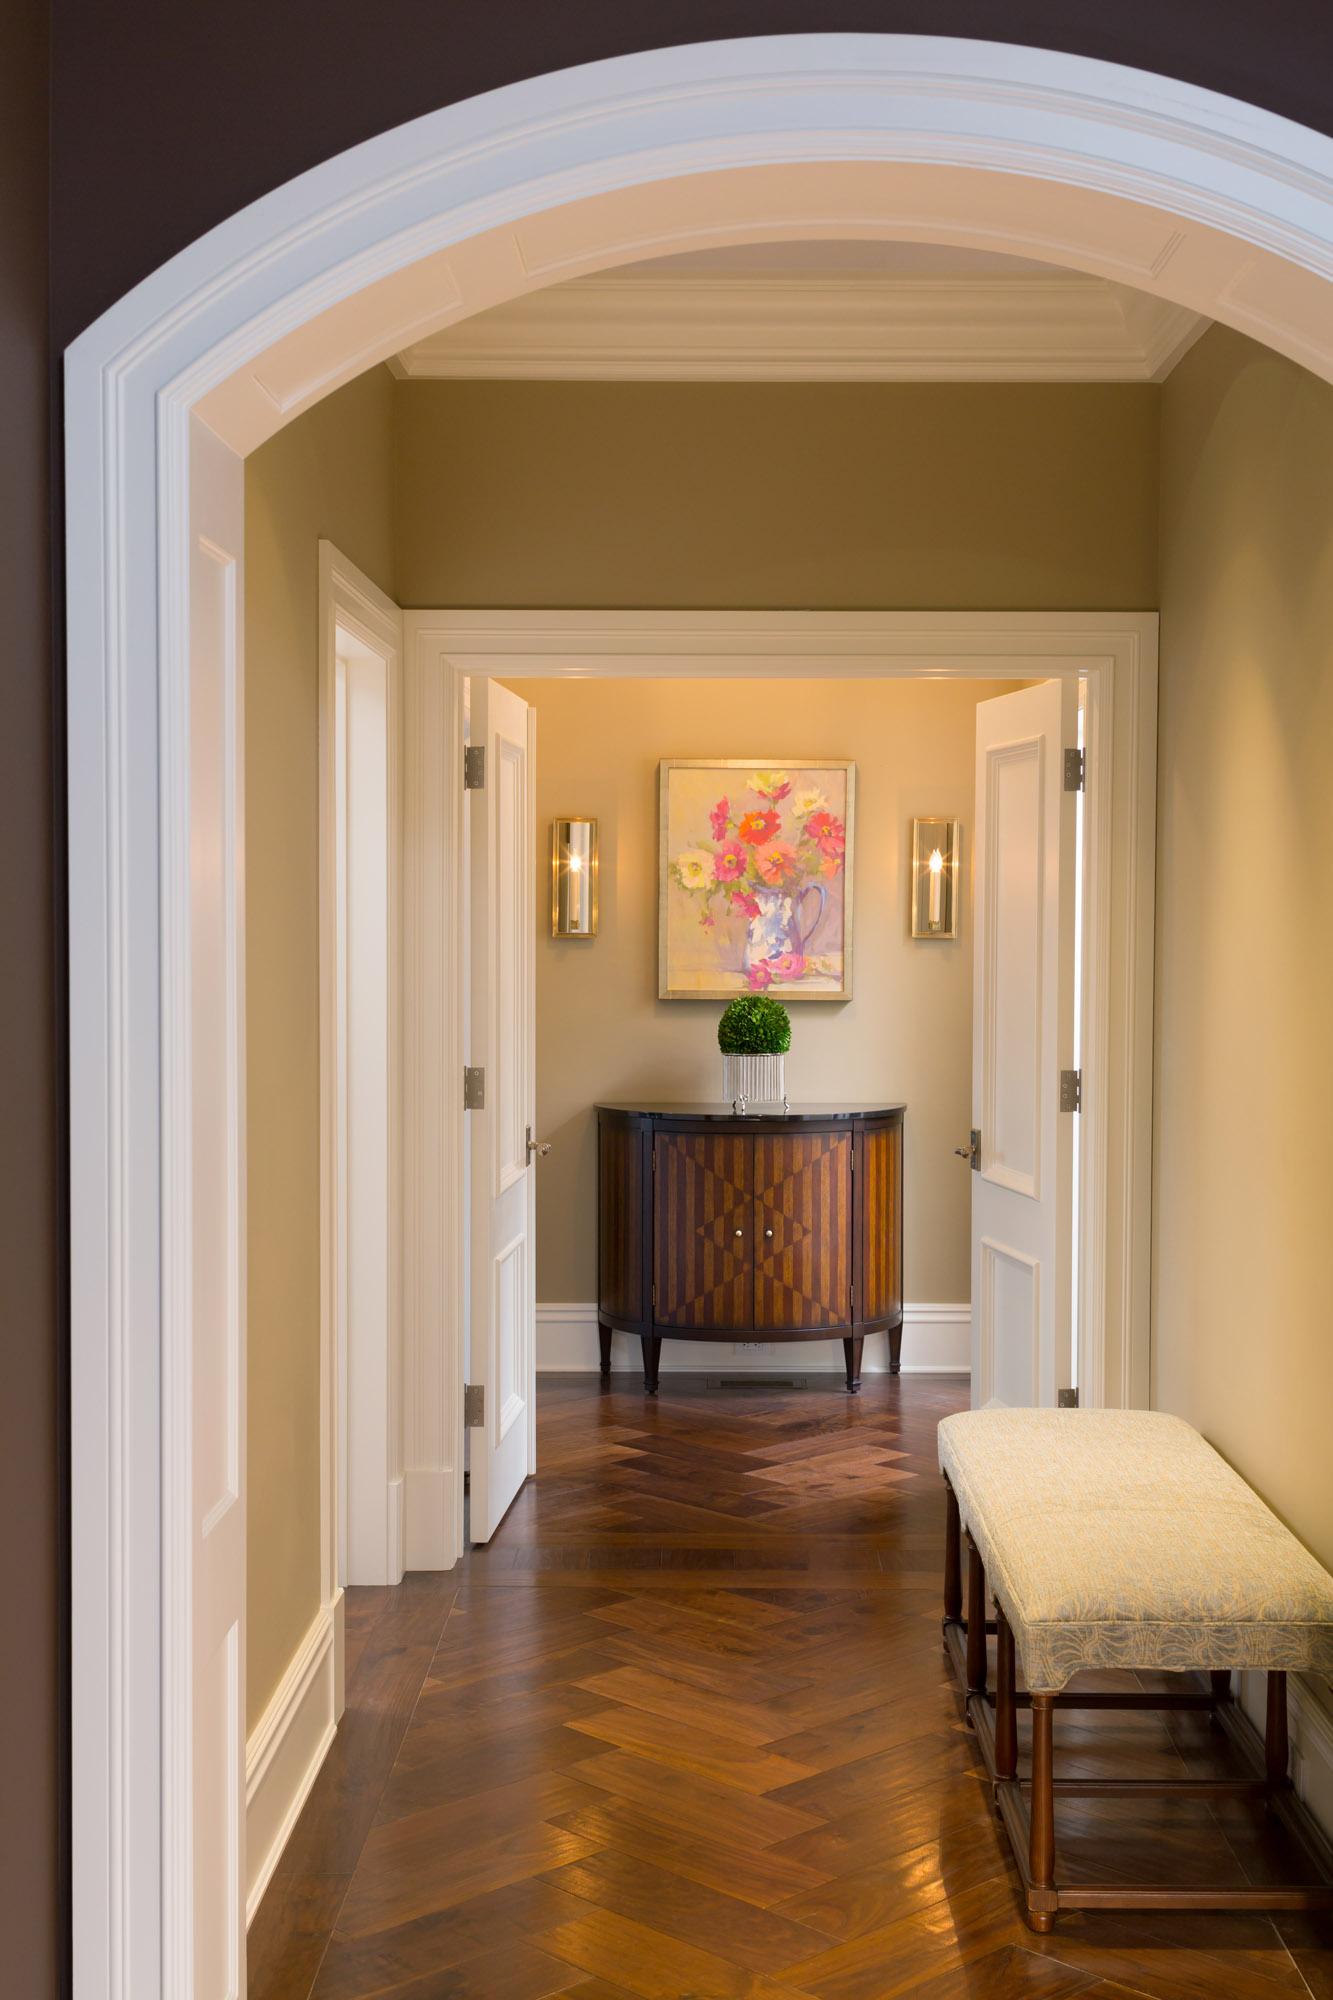 Hallway_tight-4364_original.jpg